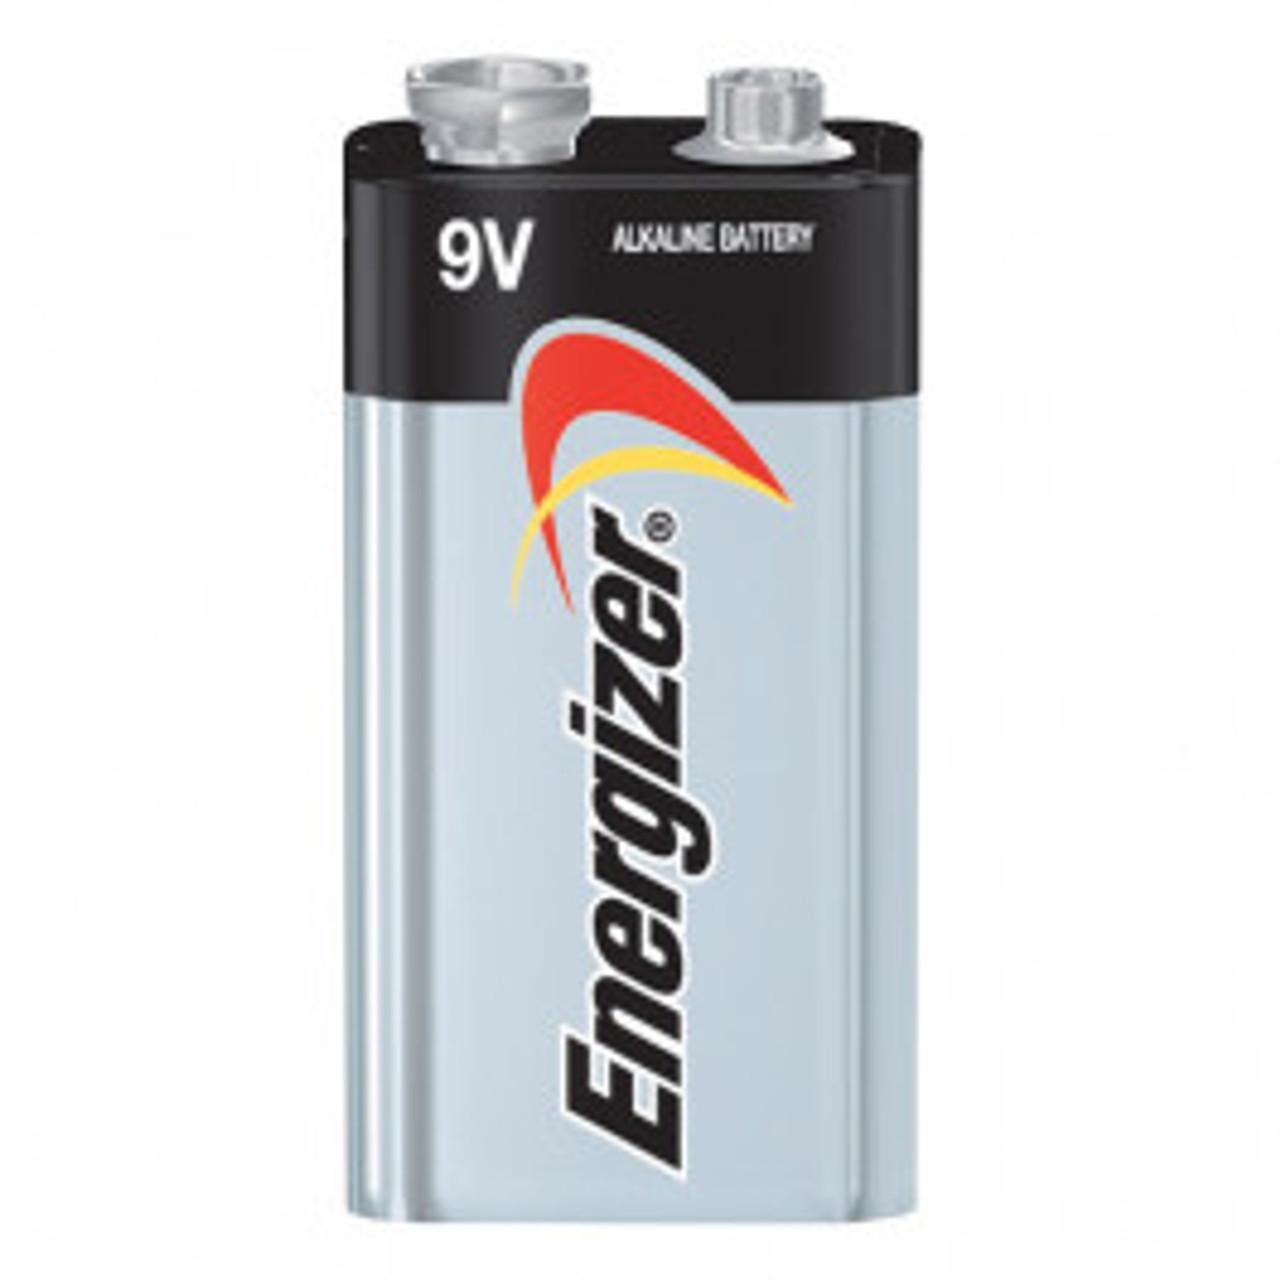 9 Volt Size Battery, 1 pack